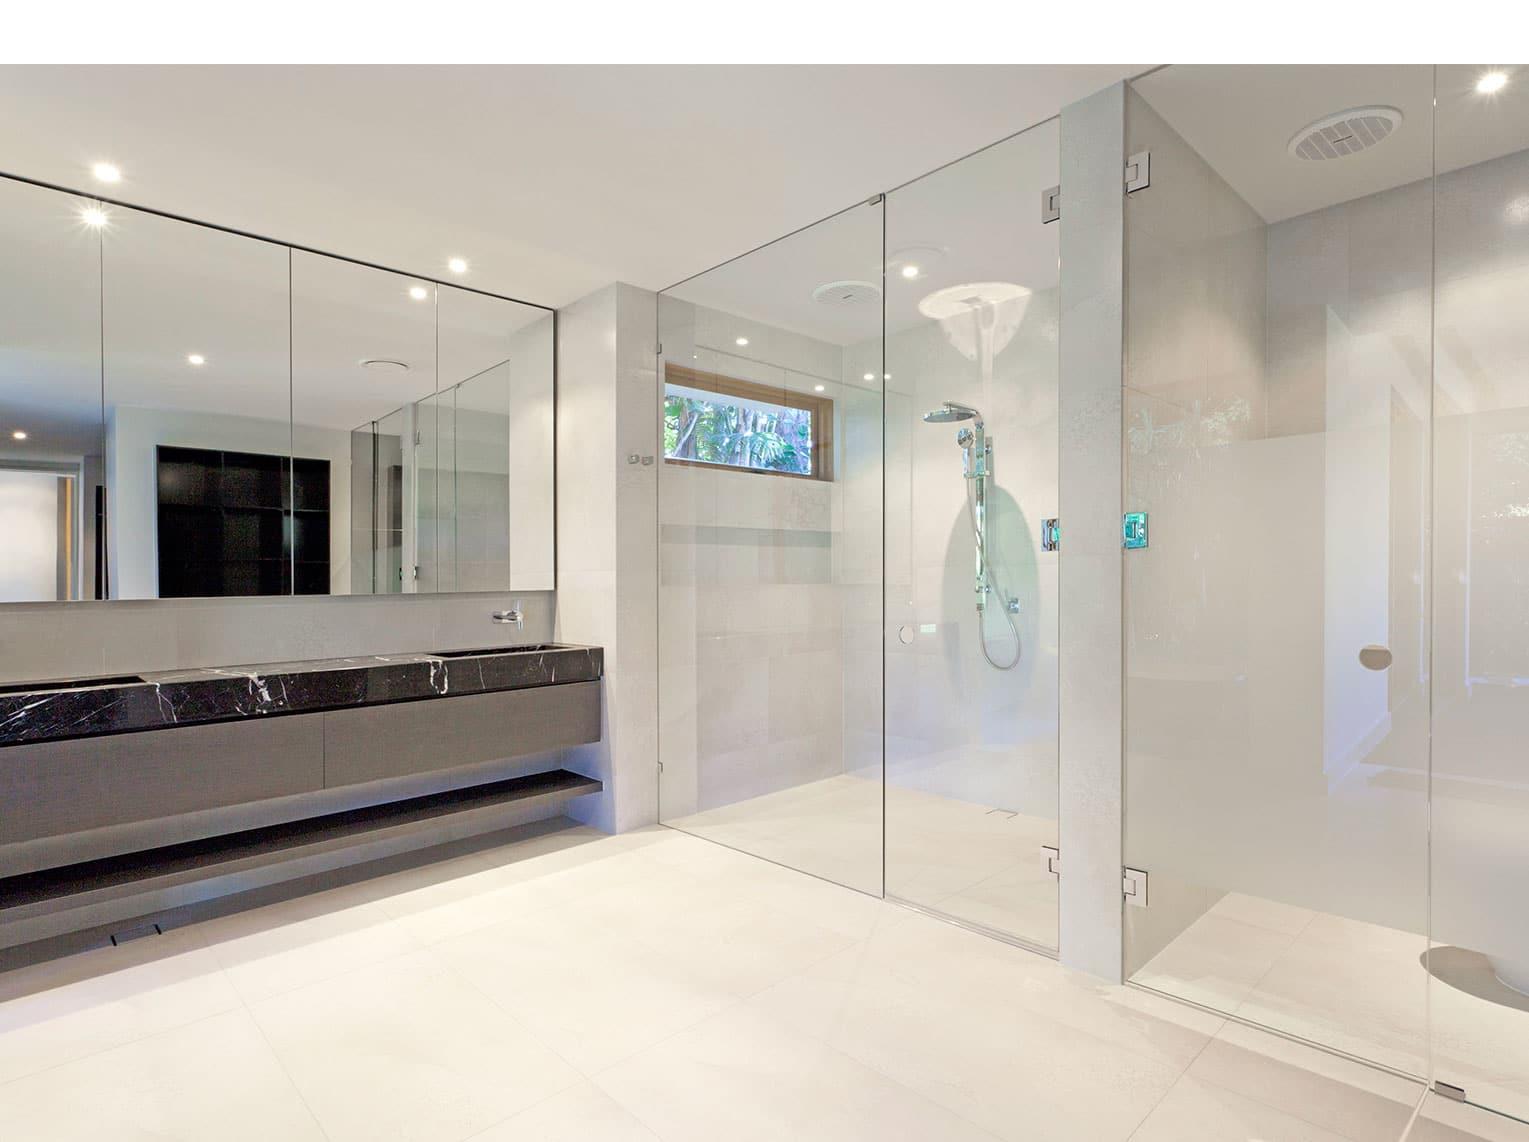 Real Benefits From Black Frameless Shower Screens